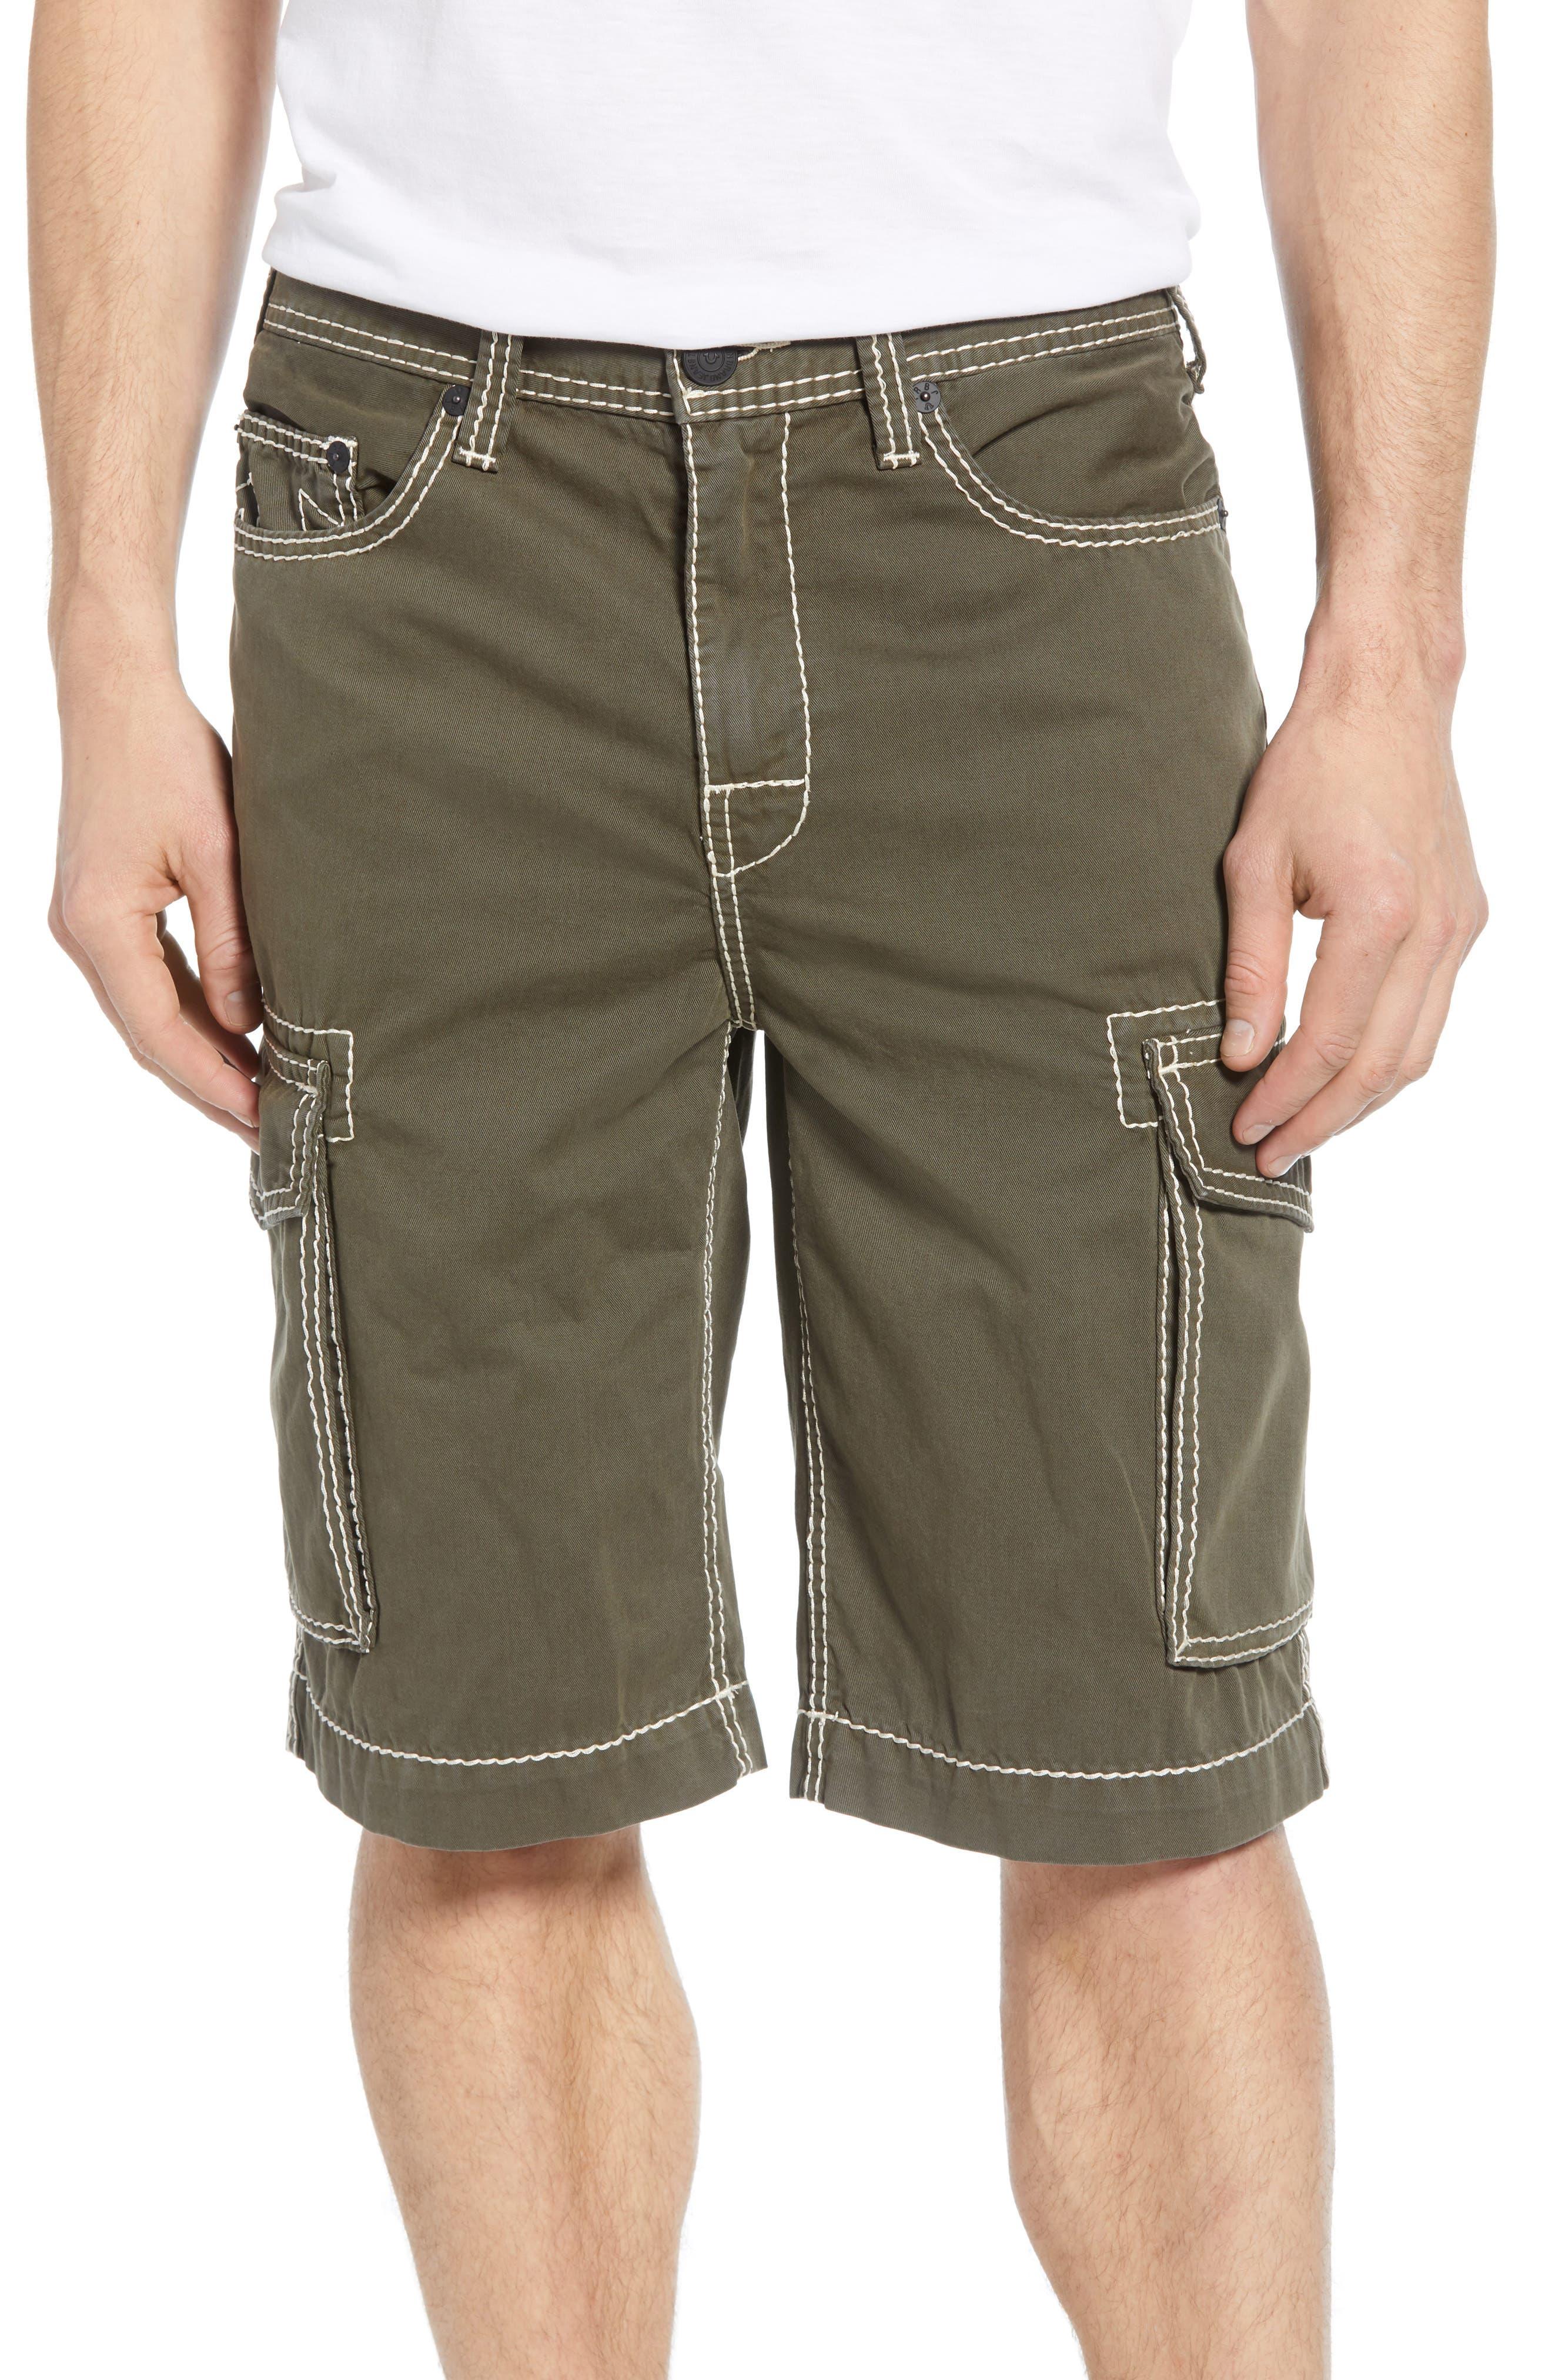 True Religion Brand Jeans Cargo Shorts, Green